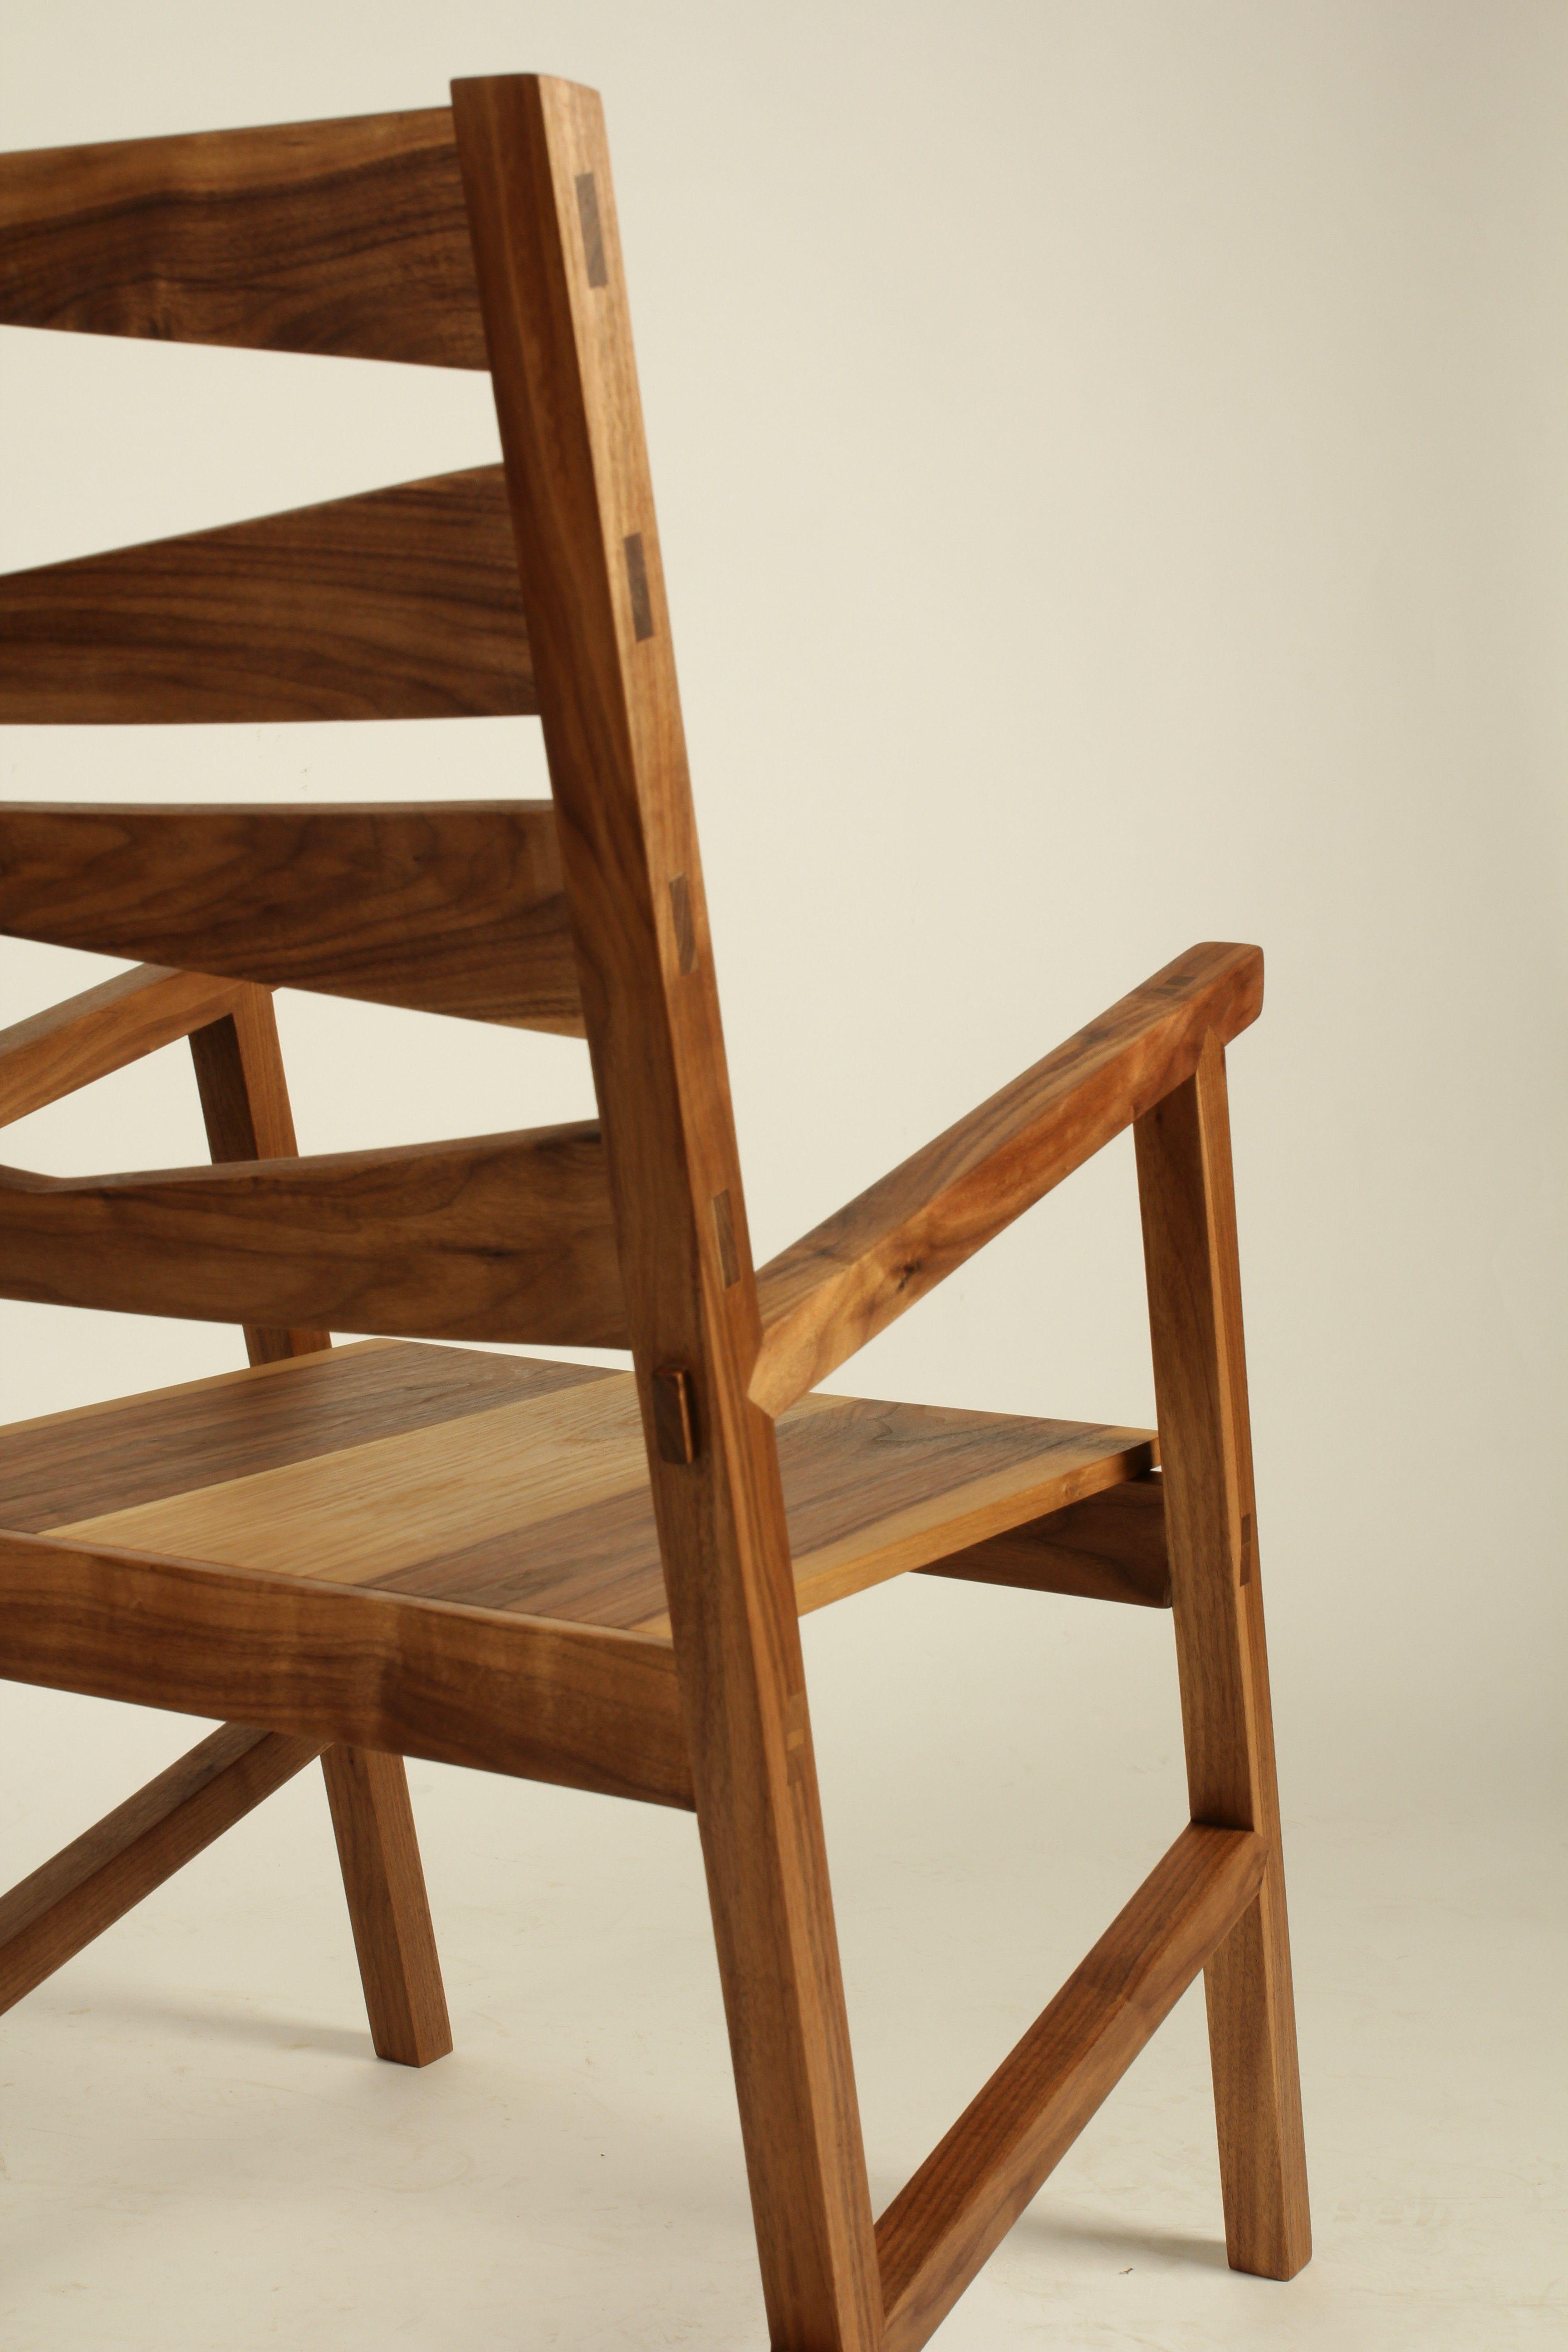 Walnut chair Walnut chair, Chair, Fine woodworking